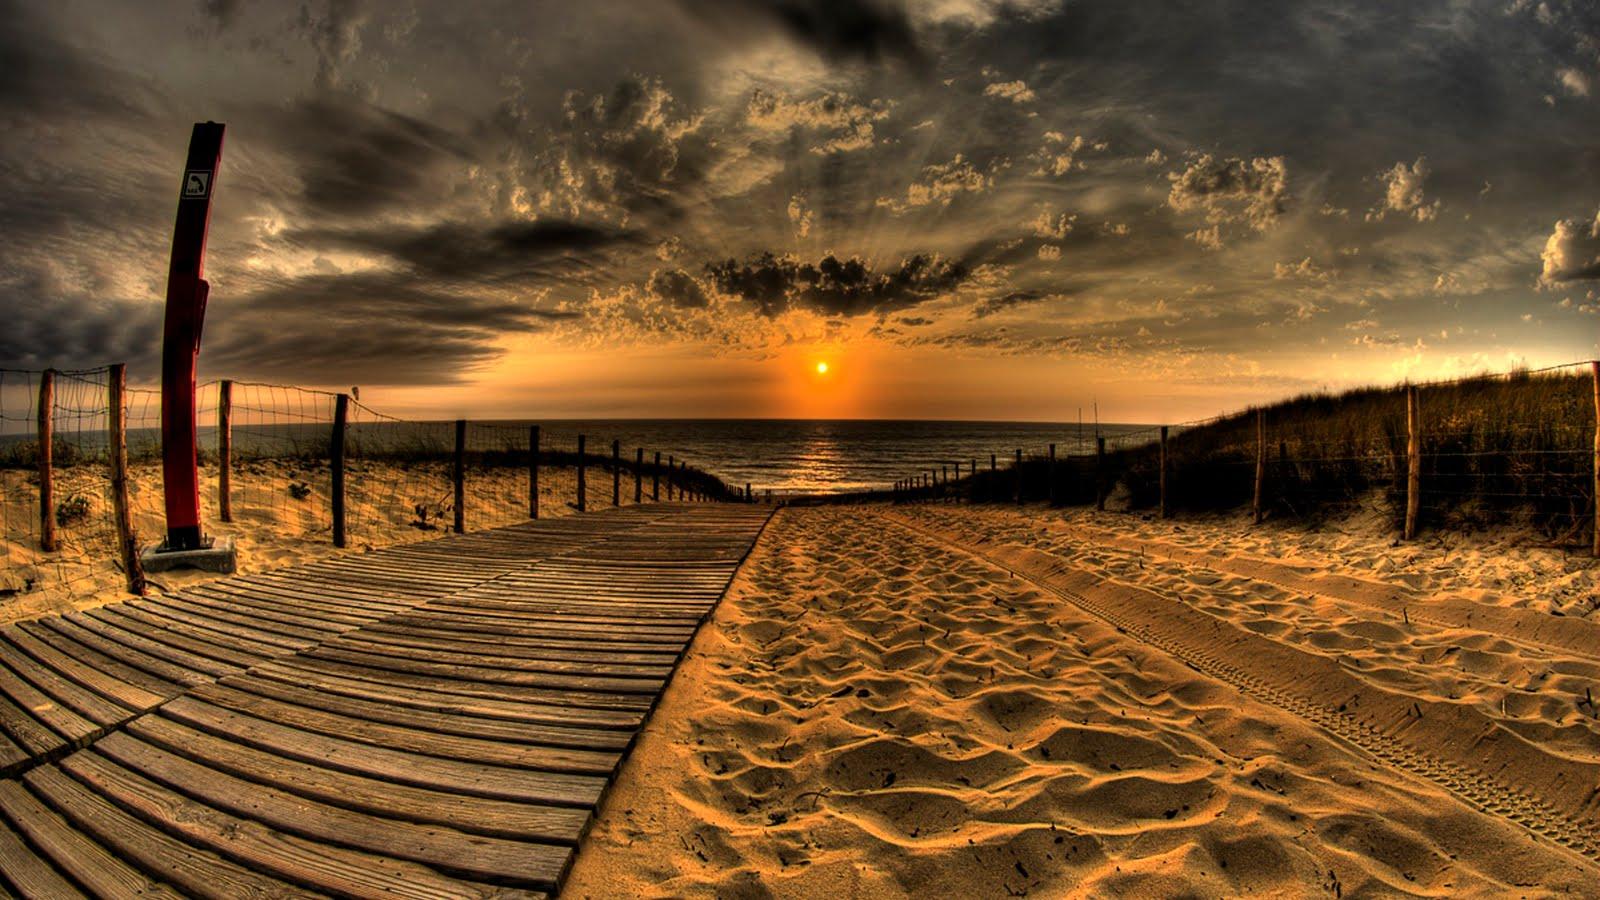 Amazing Wallpaper - Summer Beach | Photo Gallery-RX